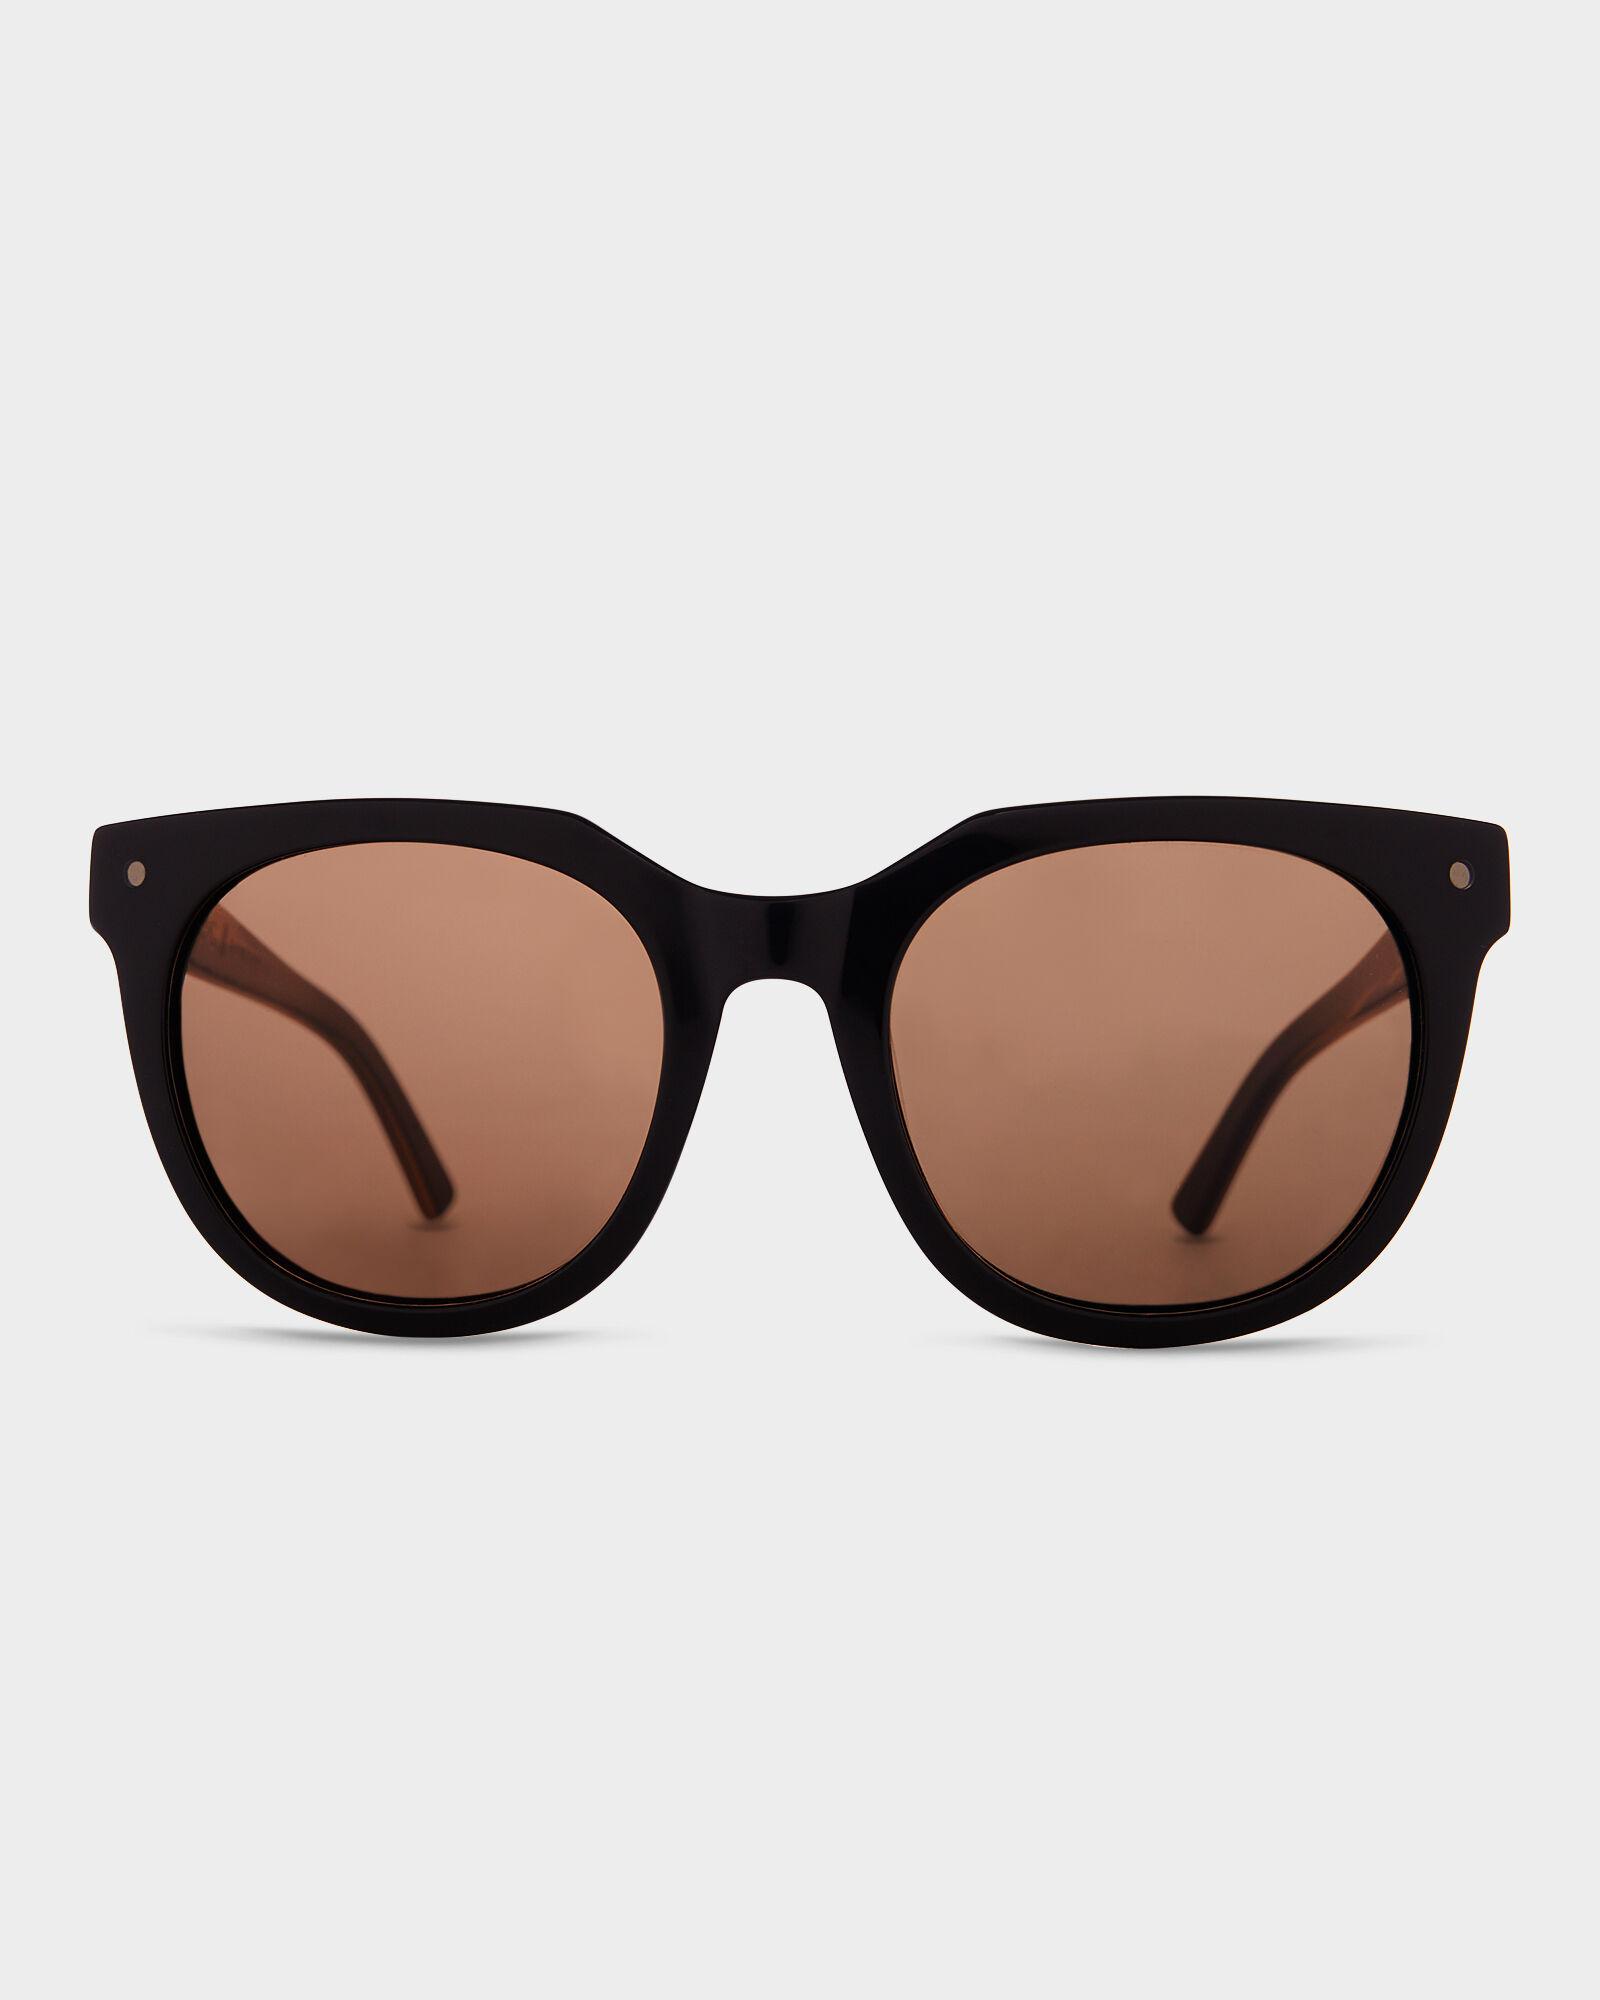 RRP $209.99 New in VZ Case Unisex VZ Von Zipper Wooster Crystal Sunglasses